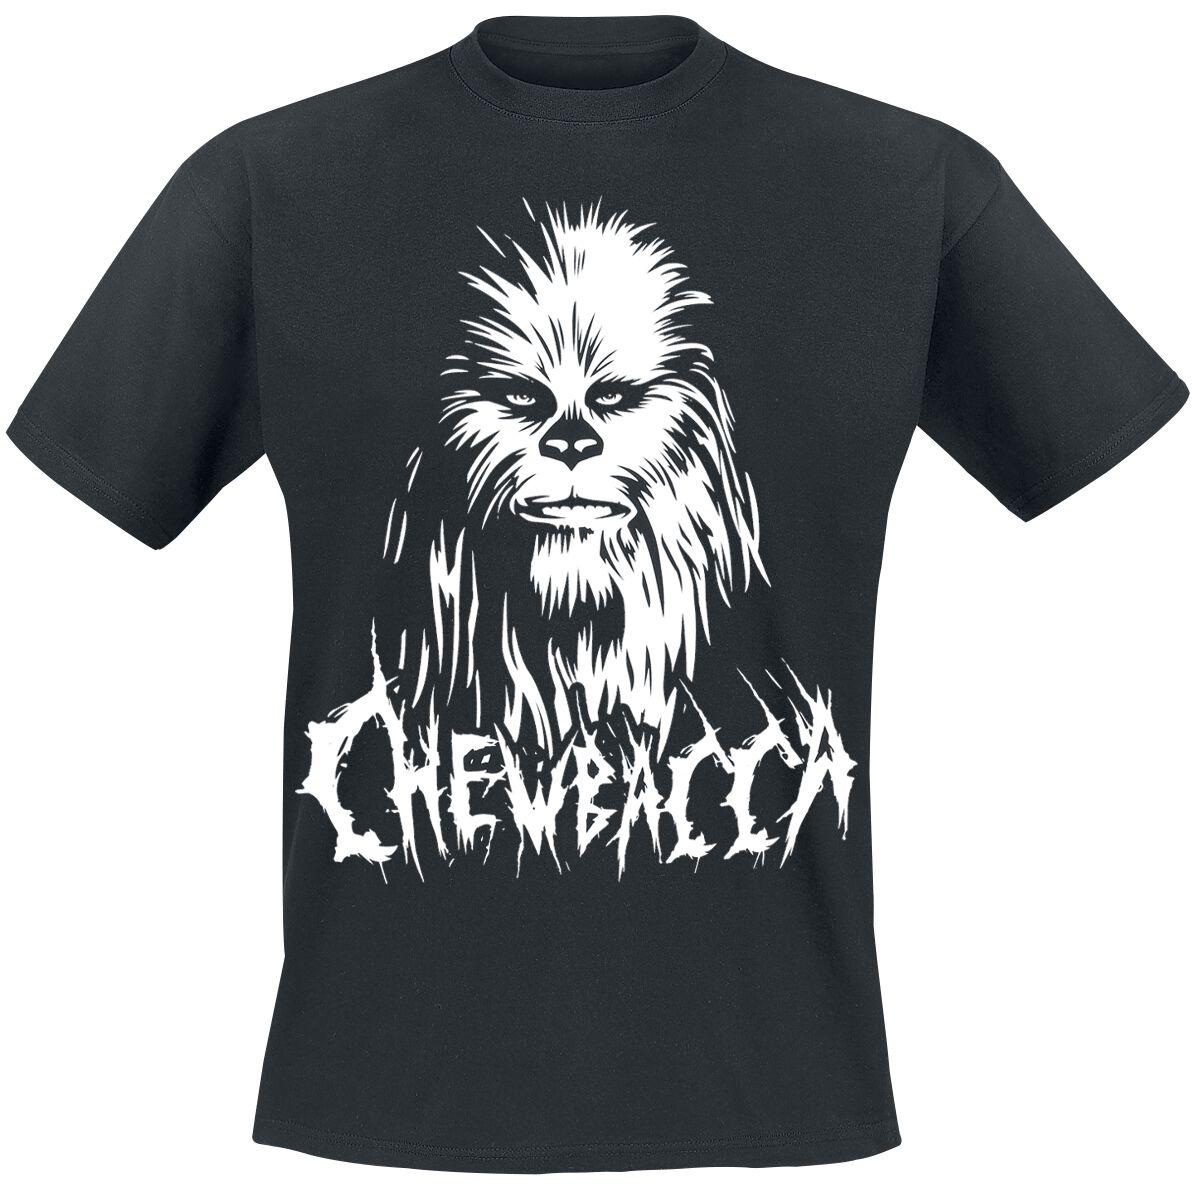 Black Metal Chewbacca Star Wars T Shirt Emp